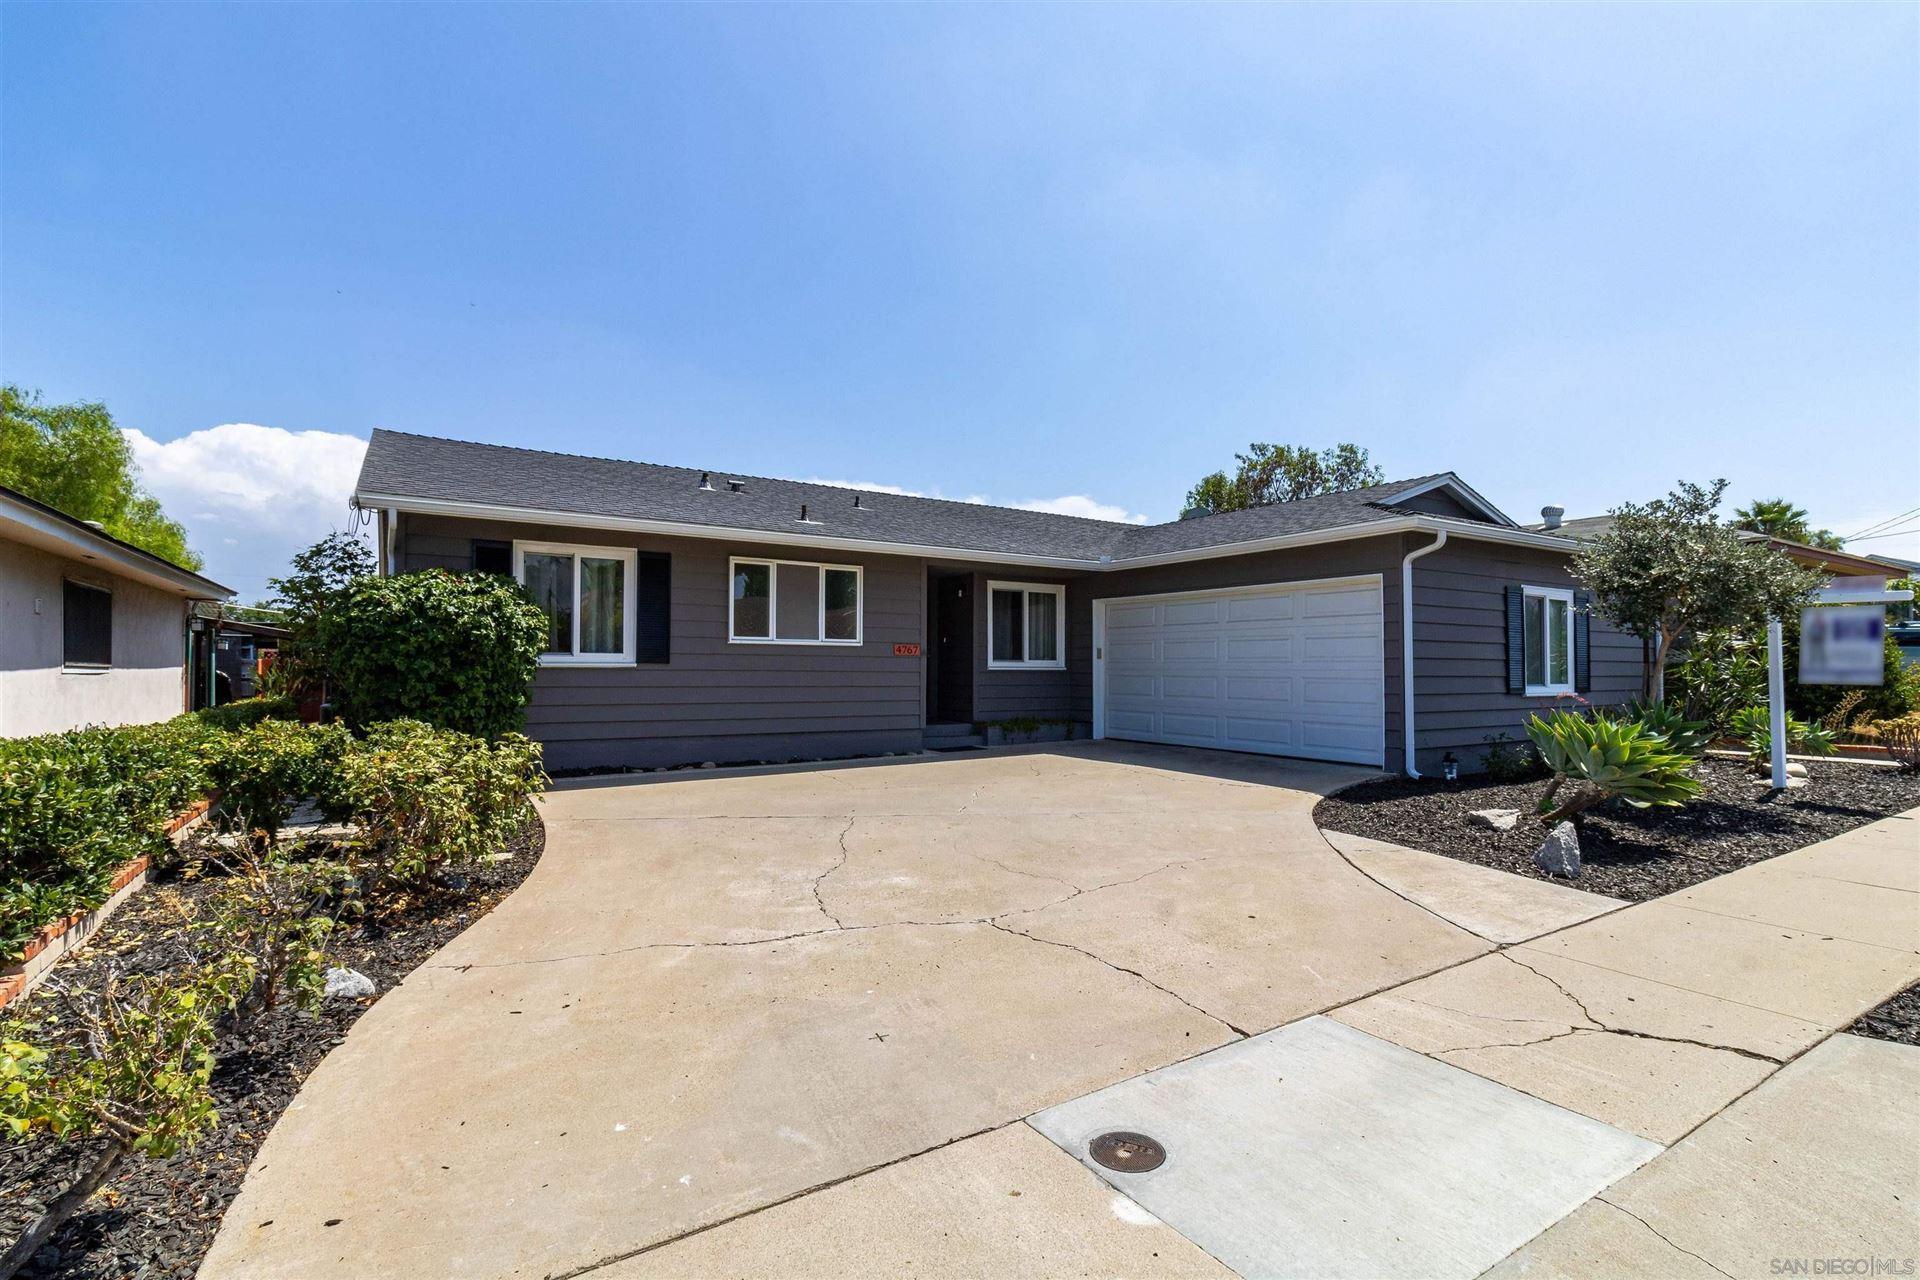 Photo of 4767 59th St., San Diego, CA 92115 (MLS # 210016305)